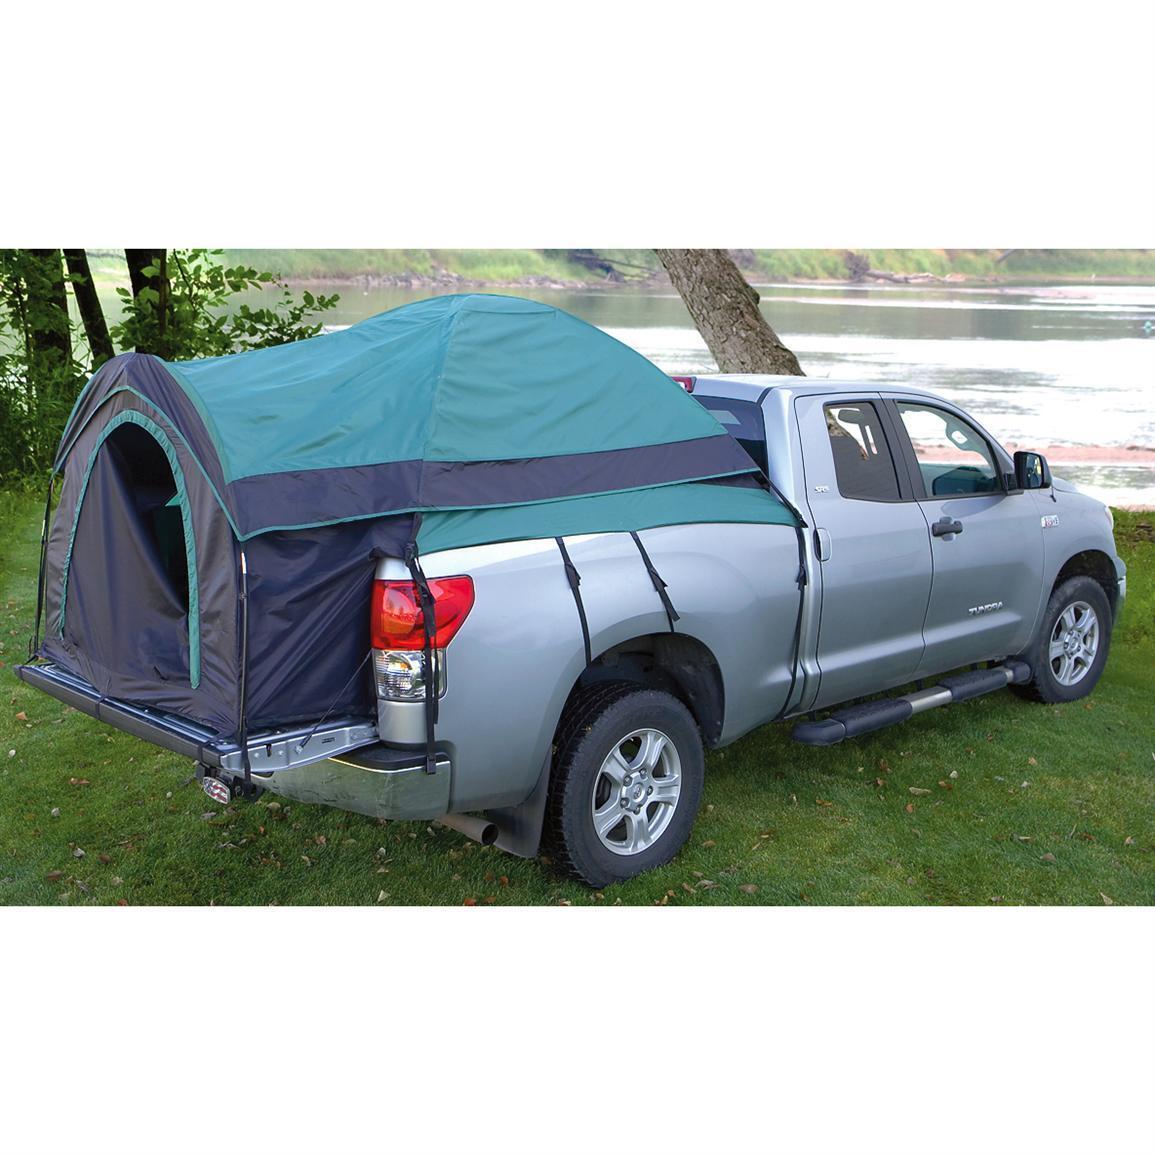 Camión de tamaño completo Cochepa para Camioneta Cama Cámping de 79 a 81  Agua-Resist Camper